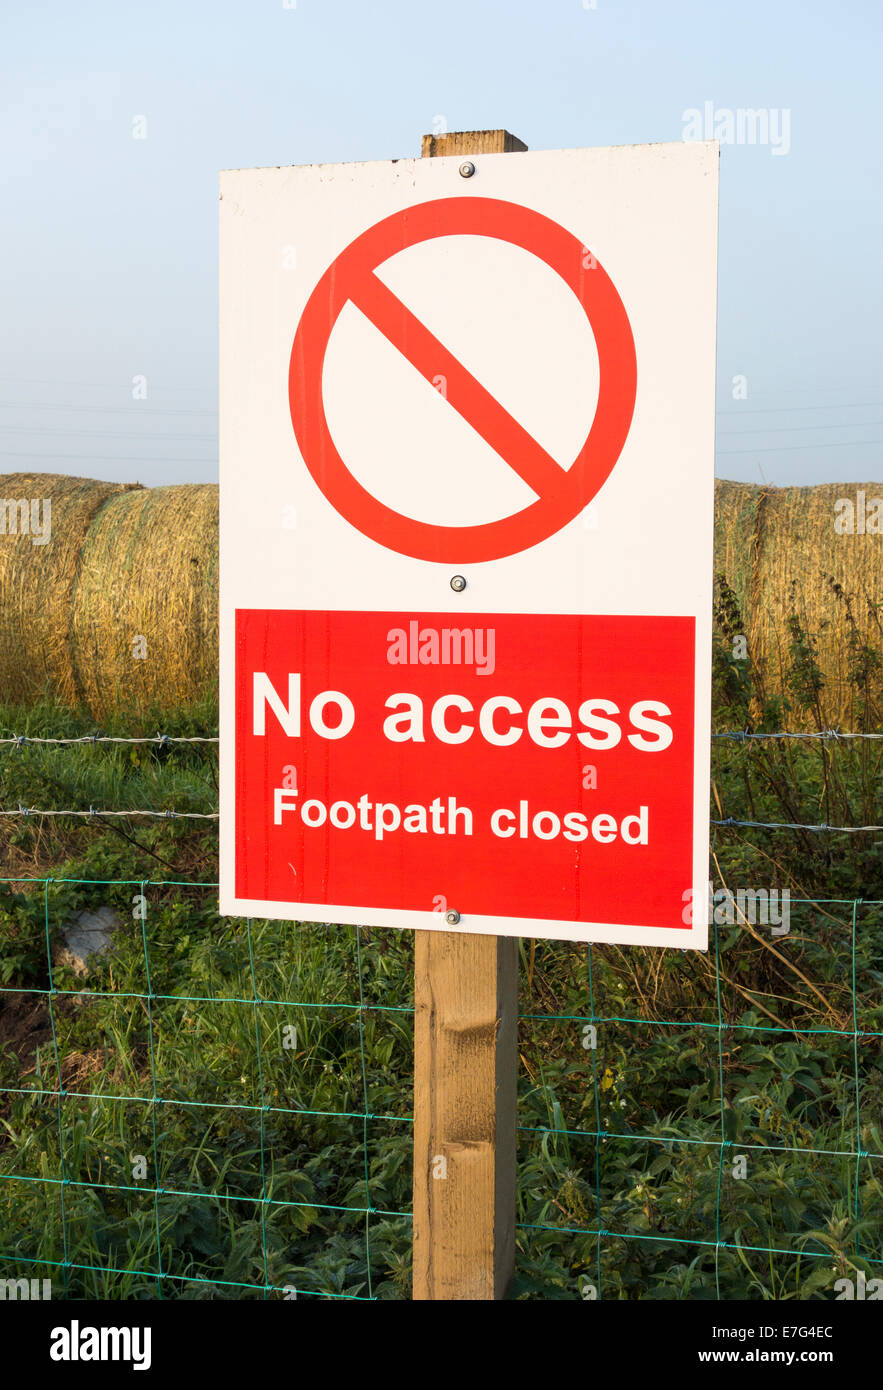 No access footpath closed sign near farm. England, UK - Stock Image